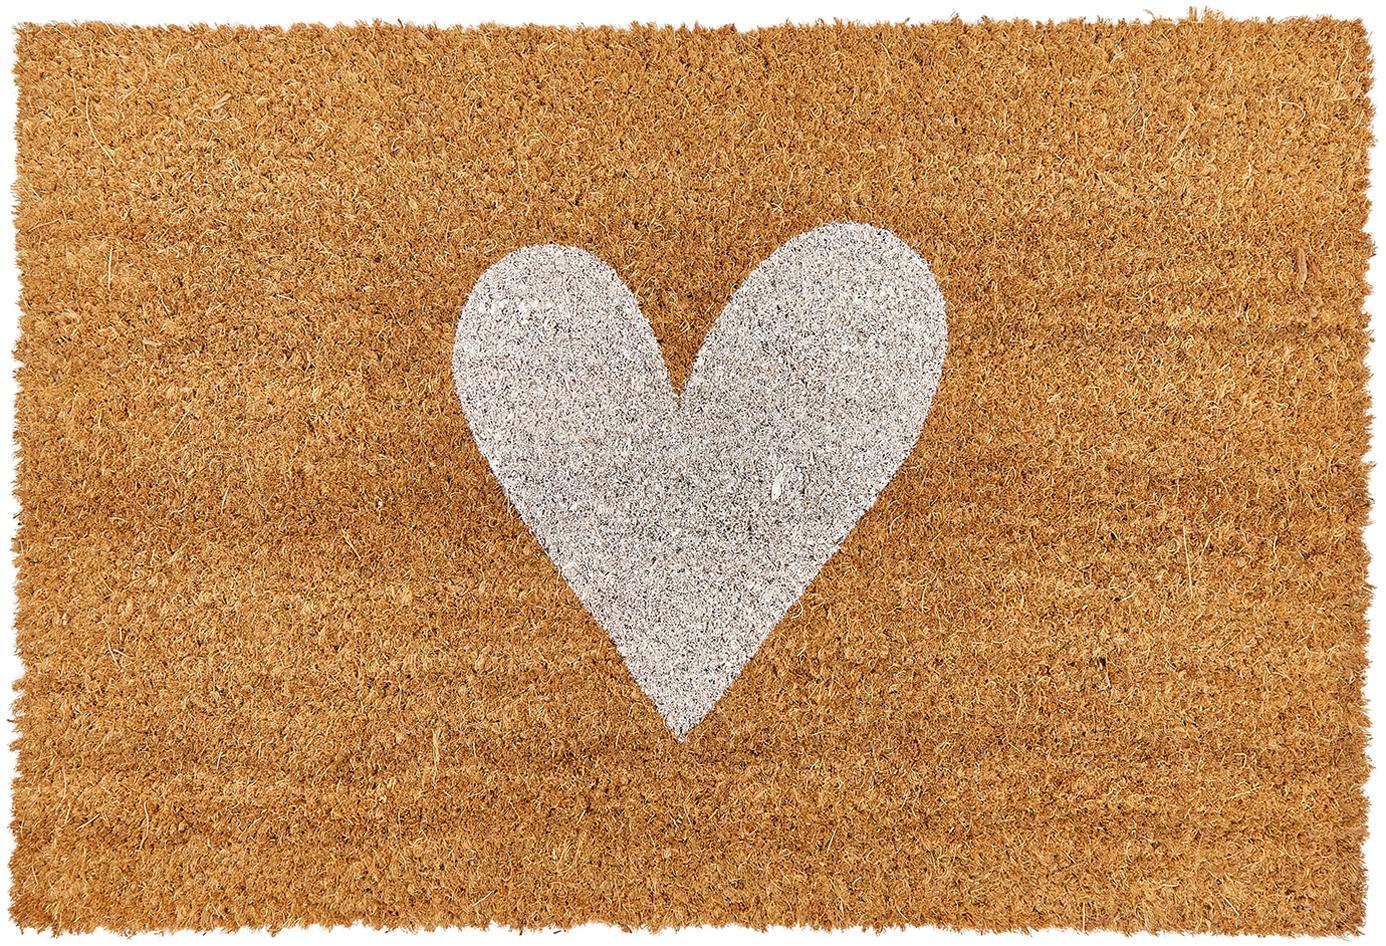 Felpudo Love, Parte superior: fibras de coco, Reverso: plástico (PVC), Parte superior: beige, blanco Reverso: negro, An 40 x L 60 cm